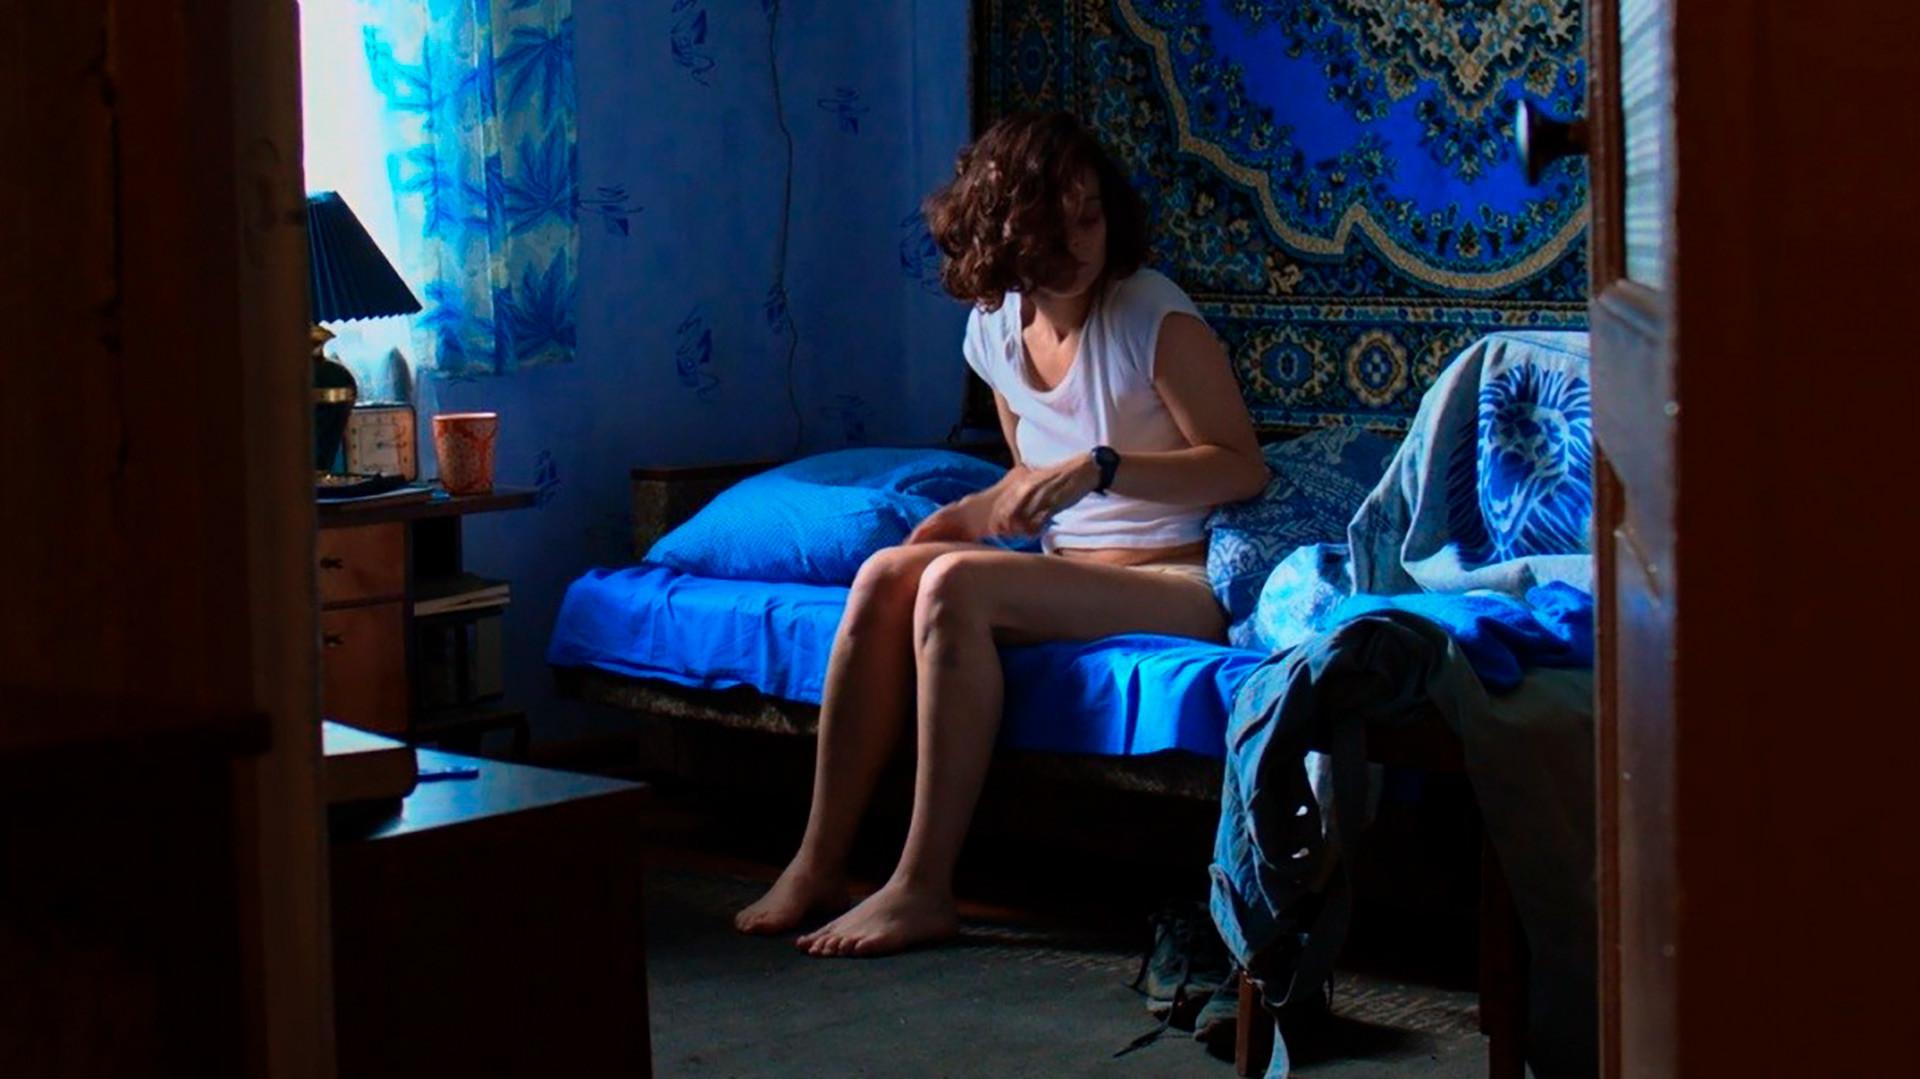 cinq films russes sortis en 2017 voir absolument russia beyond fr. Black Bedroom Furniture Sets. Home Design Ideas